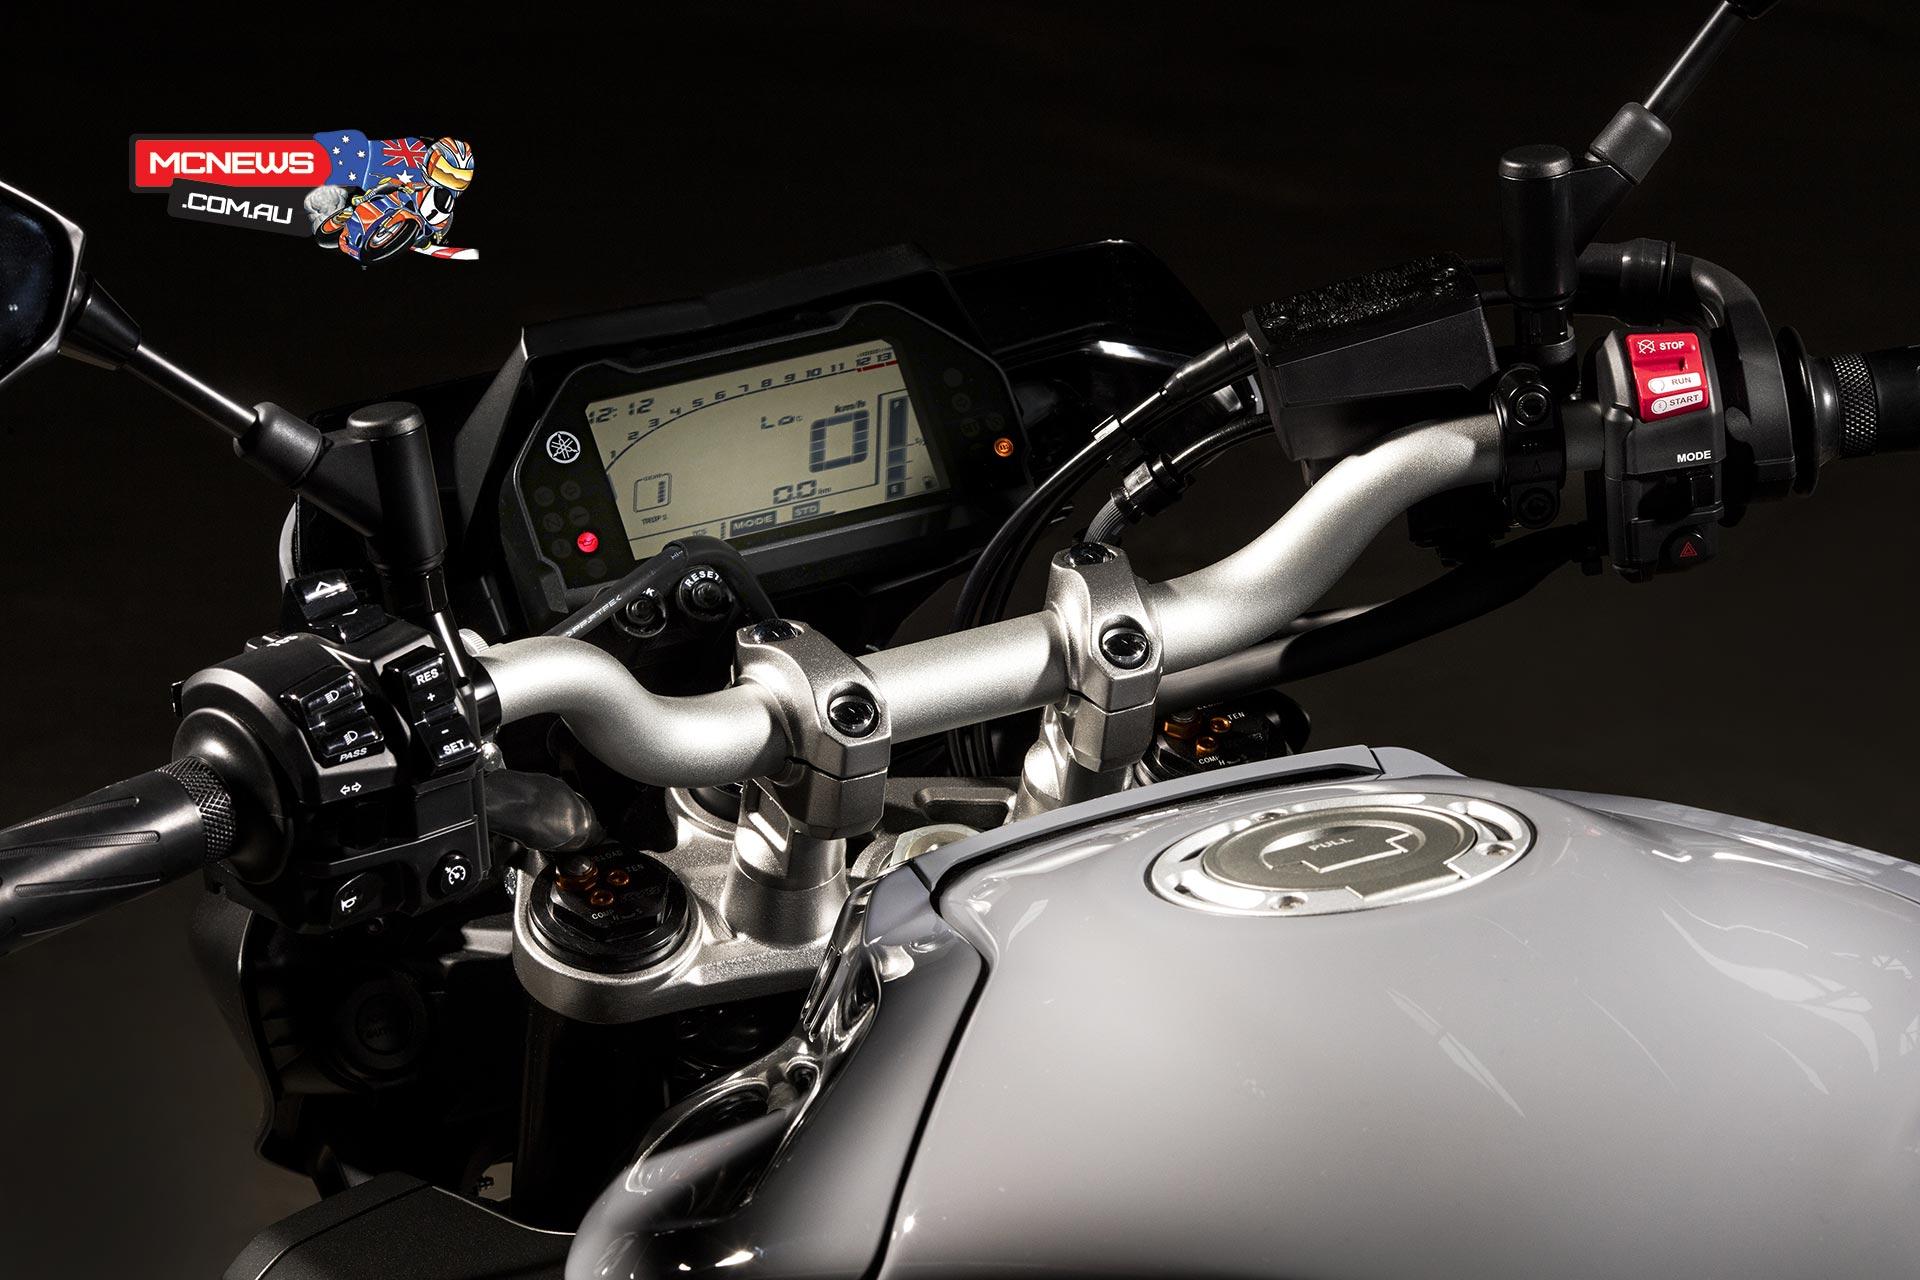 Yamaha Mt 10 Breaks Cover Mcnews Com Au